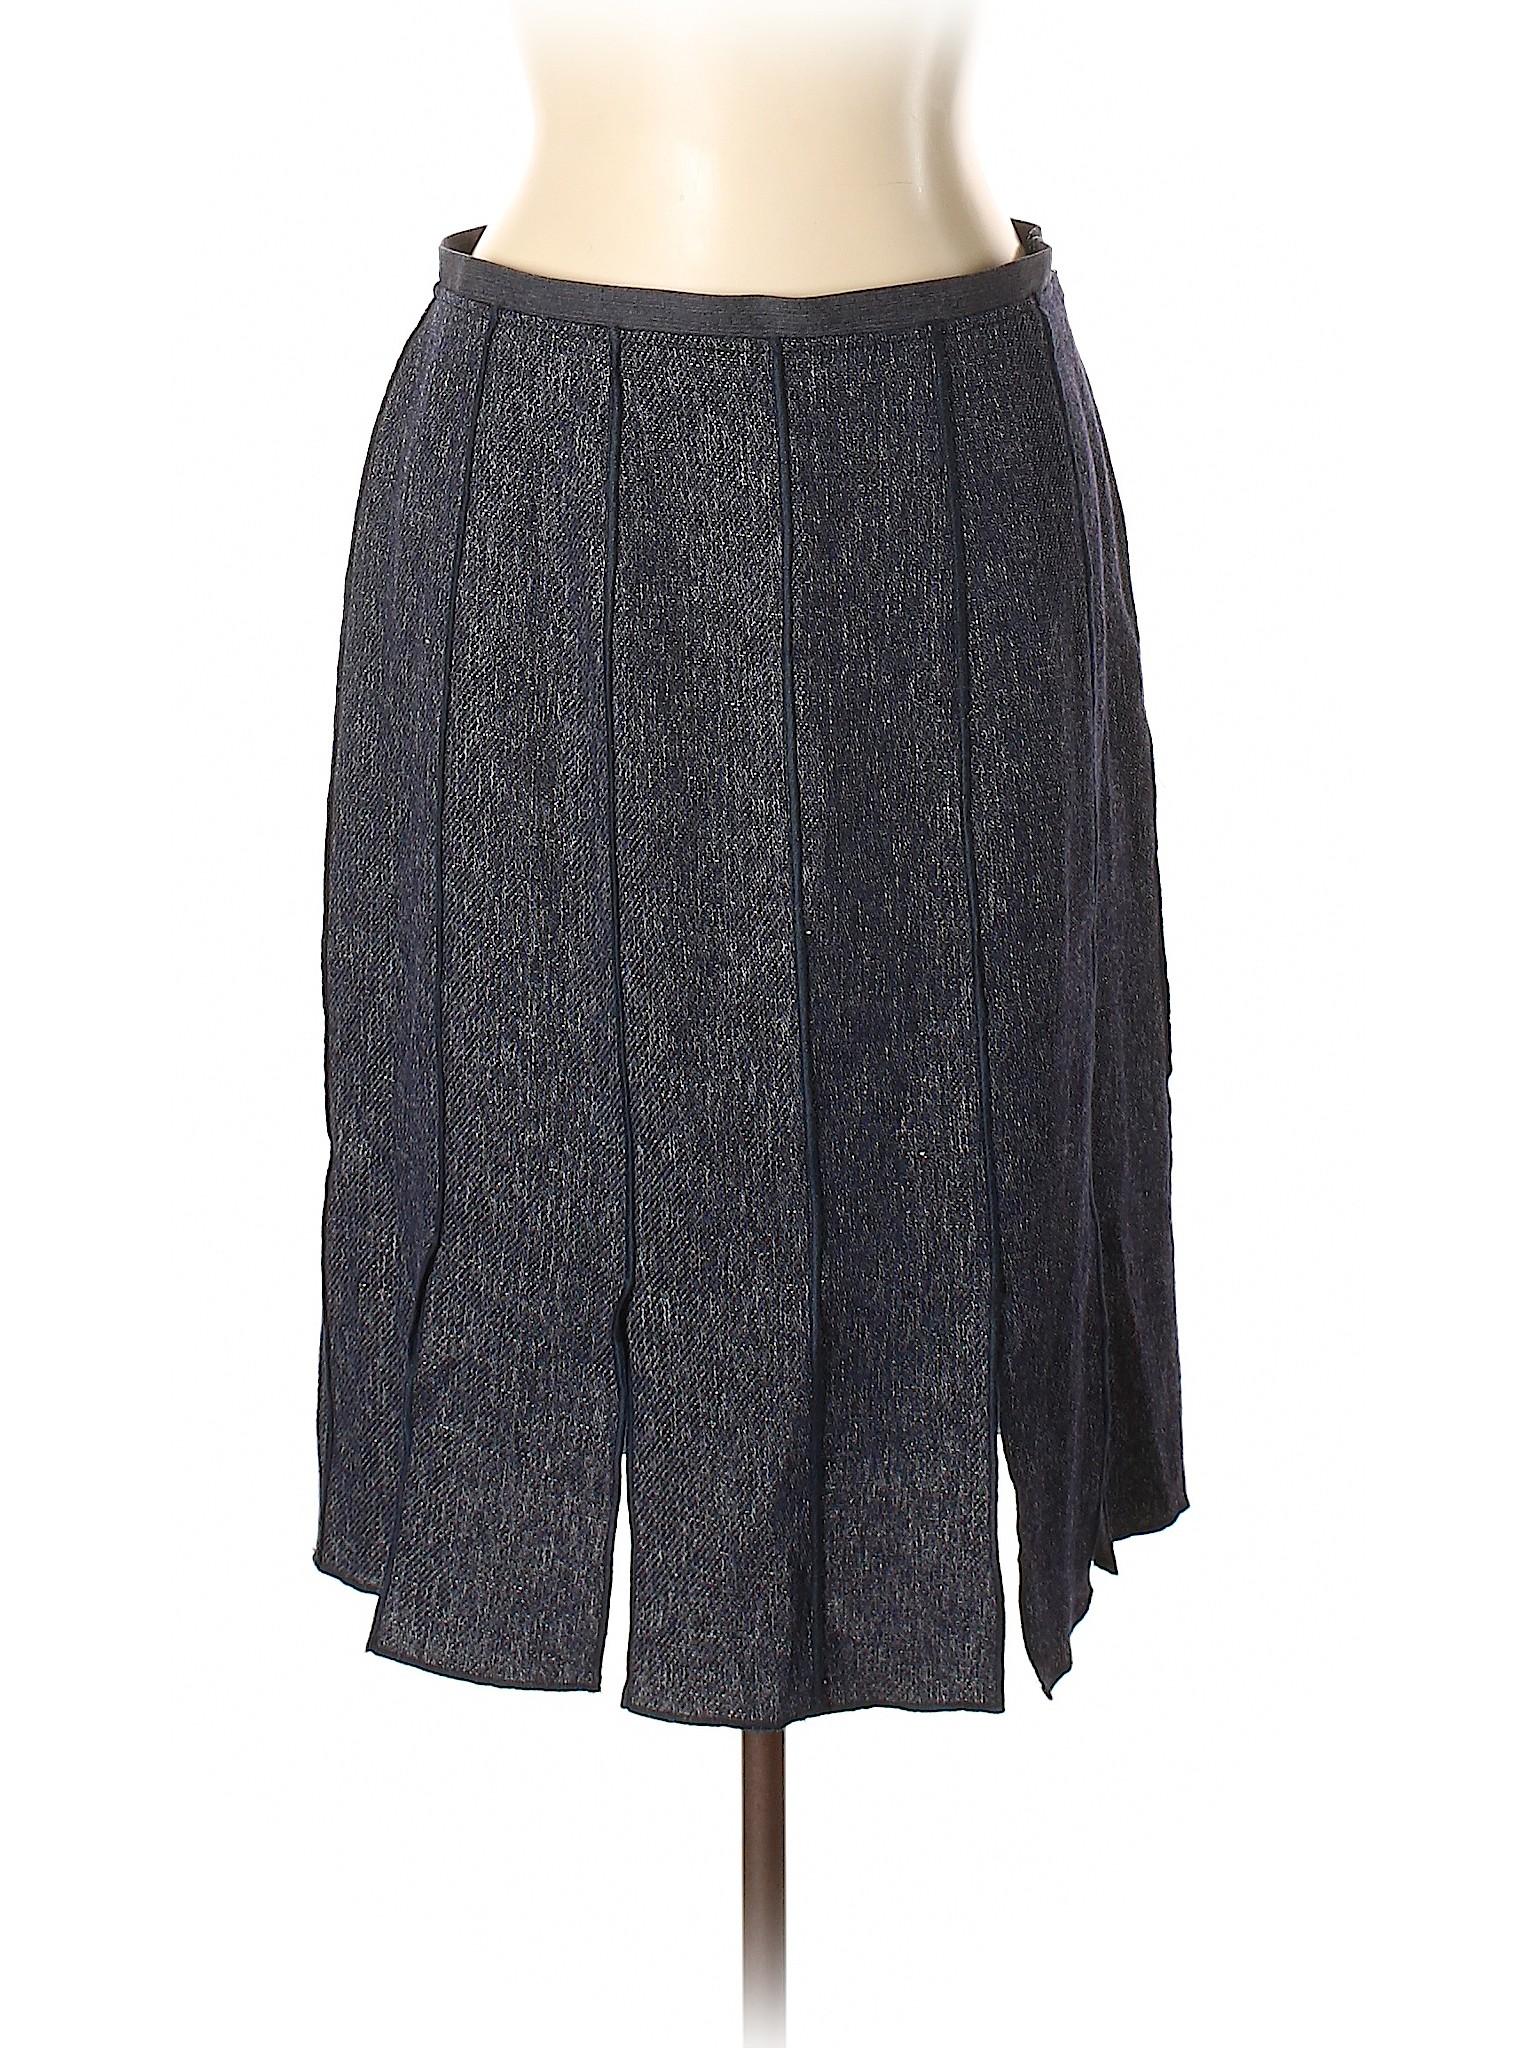 winter Skirt Worth York Leisure New Casual p81f1qga